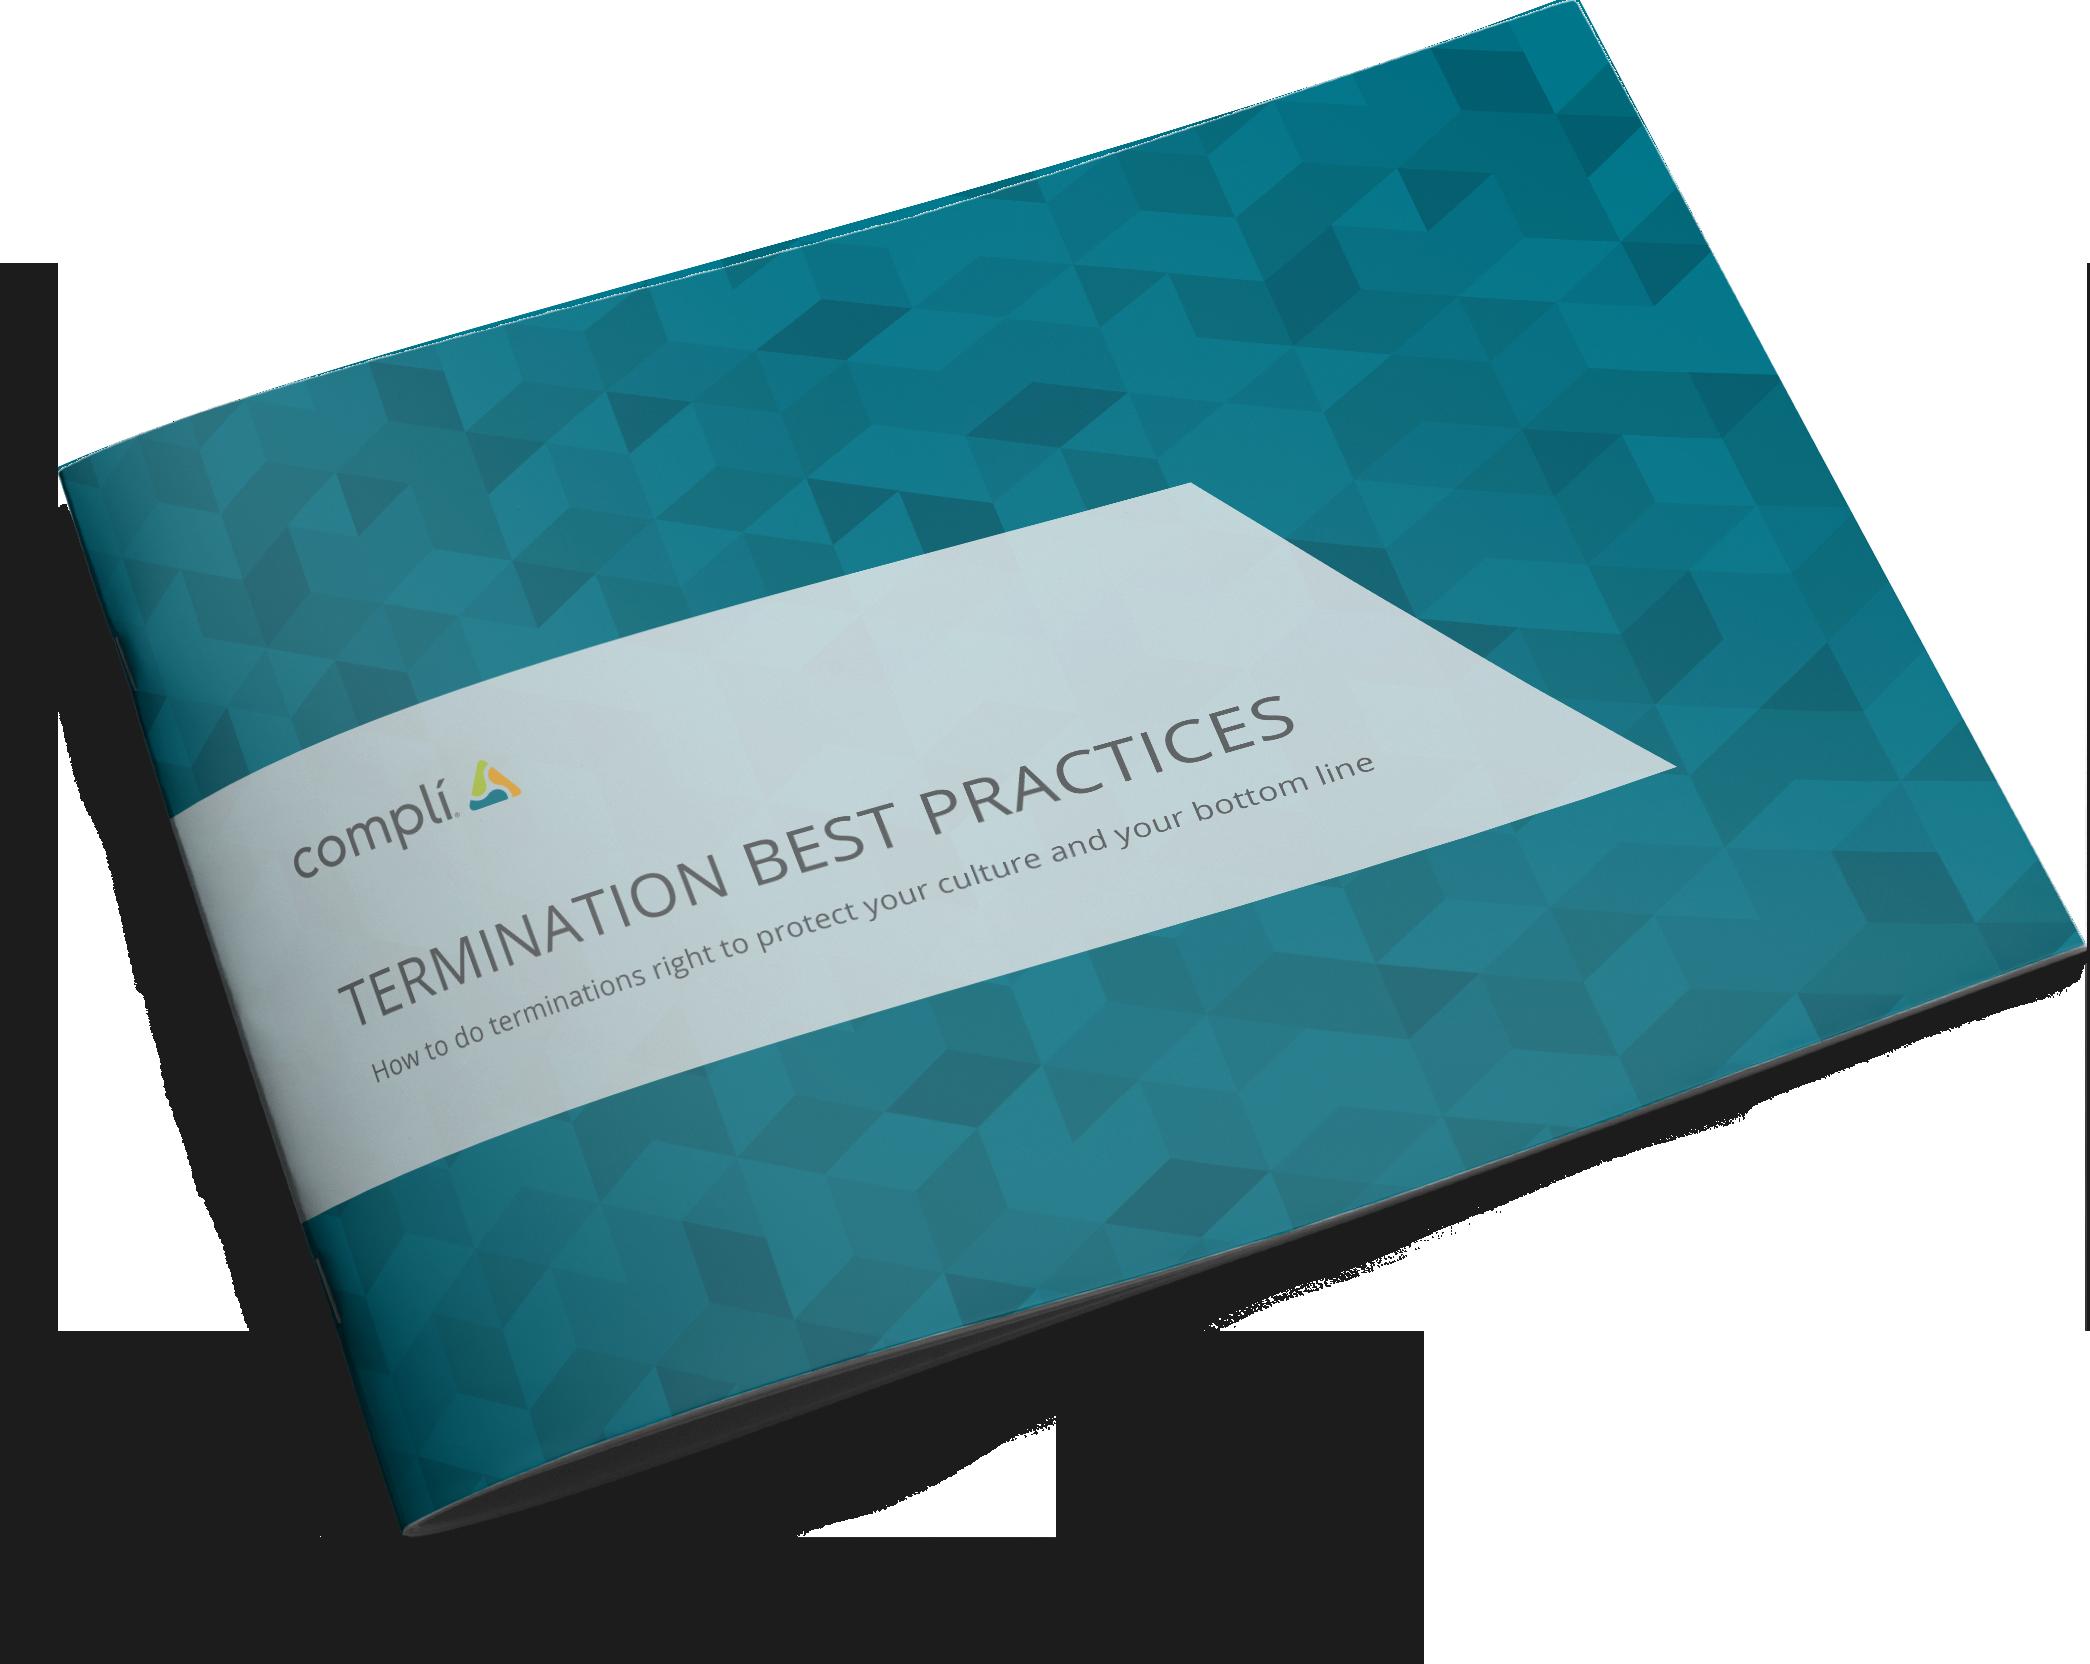 Termination ebook cover - transparent.png